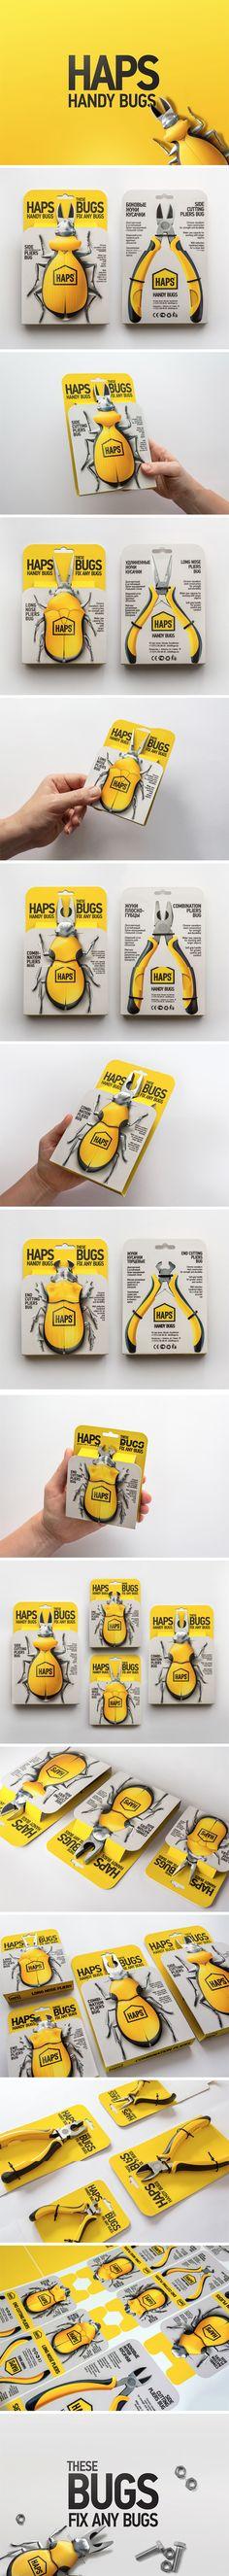 "Концепт промо-упаковки пассатижей для компании ""HAPS"""